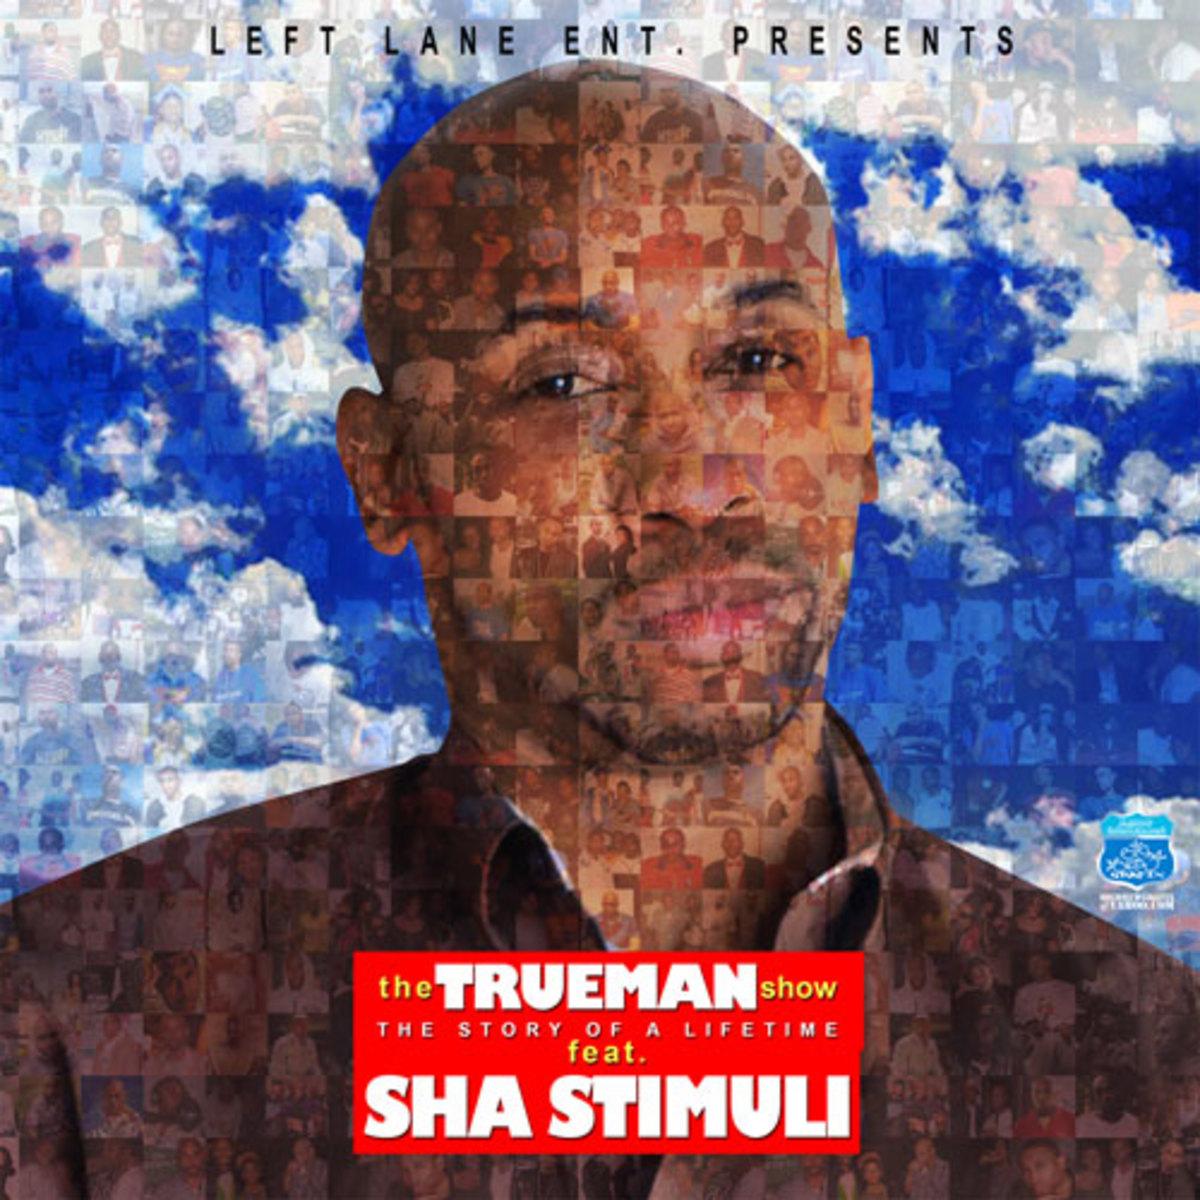 shastimuli-thetruemanshow.jpg